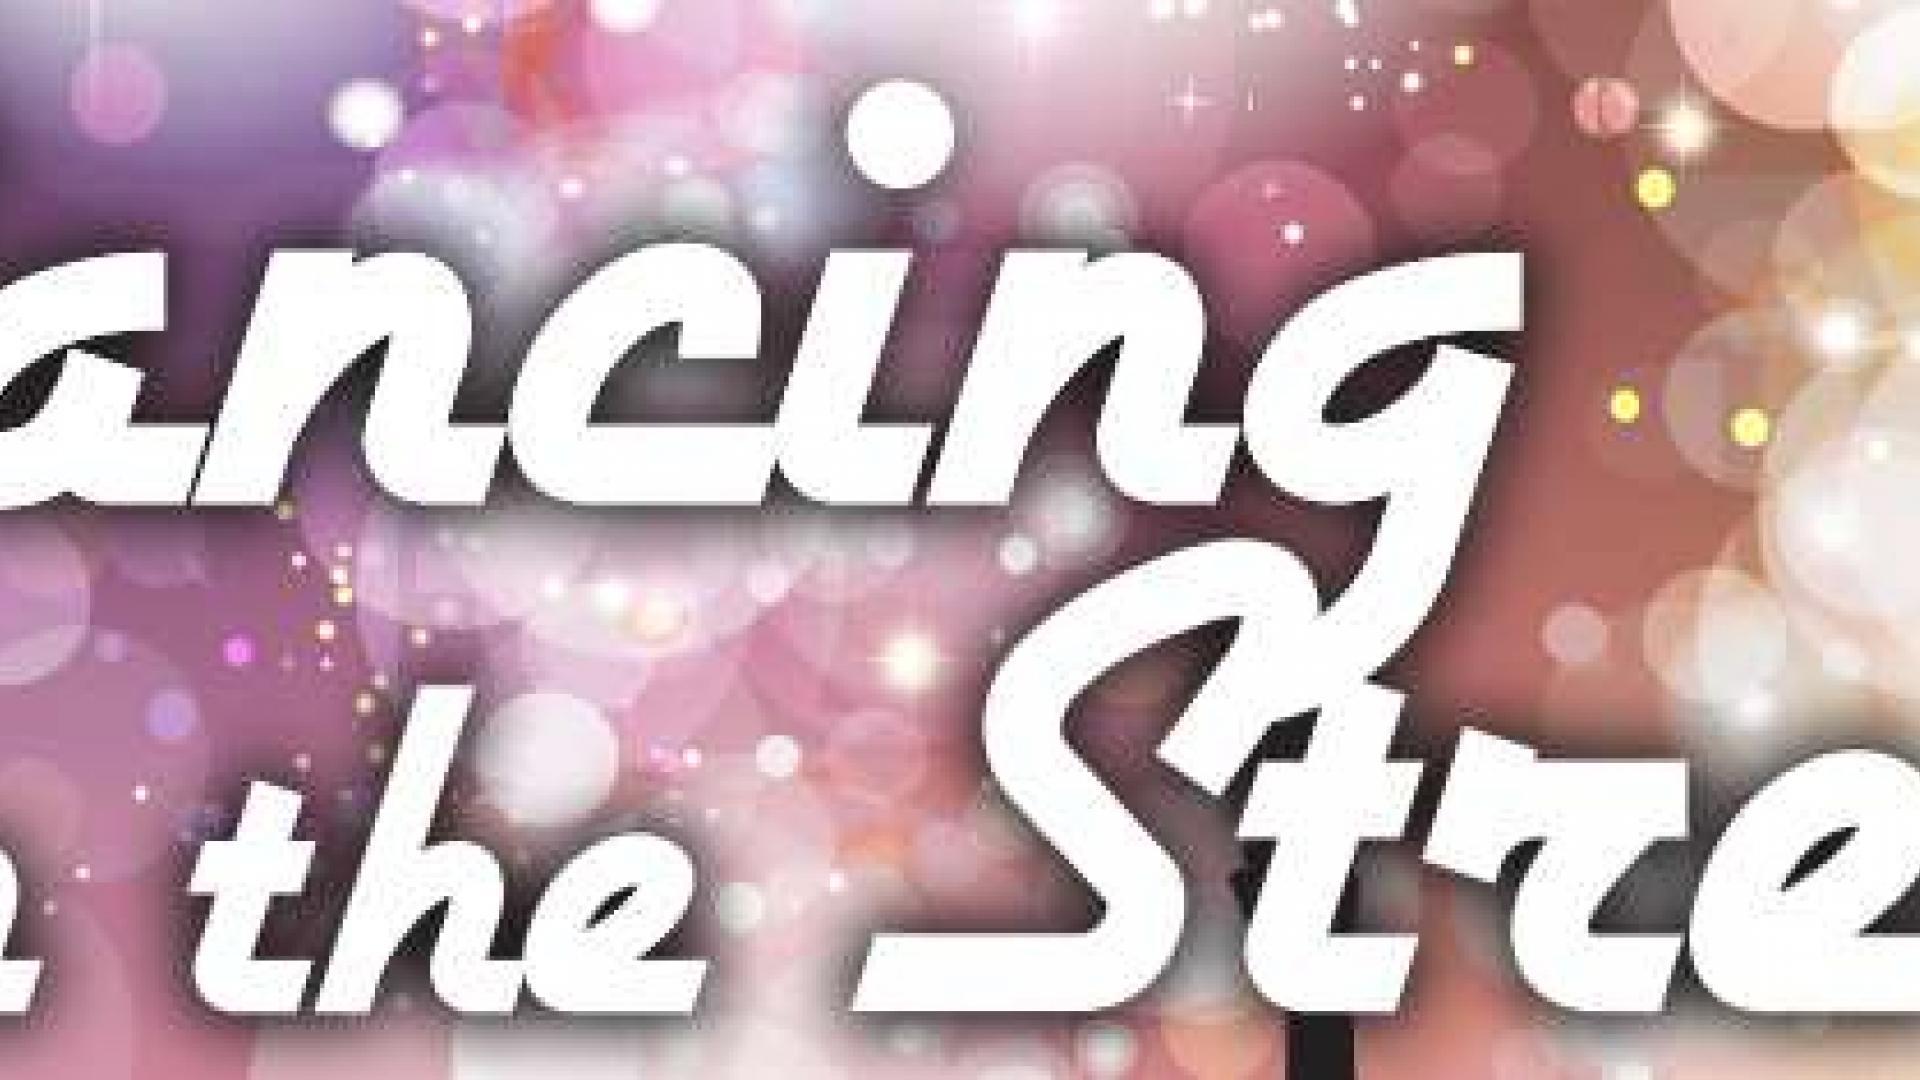 logo dancing in the street